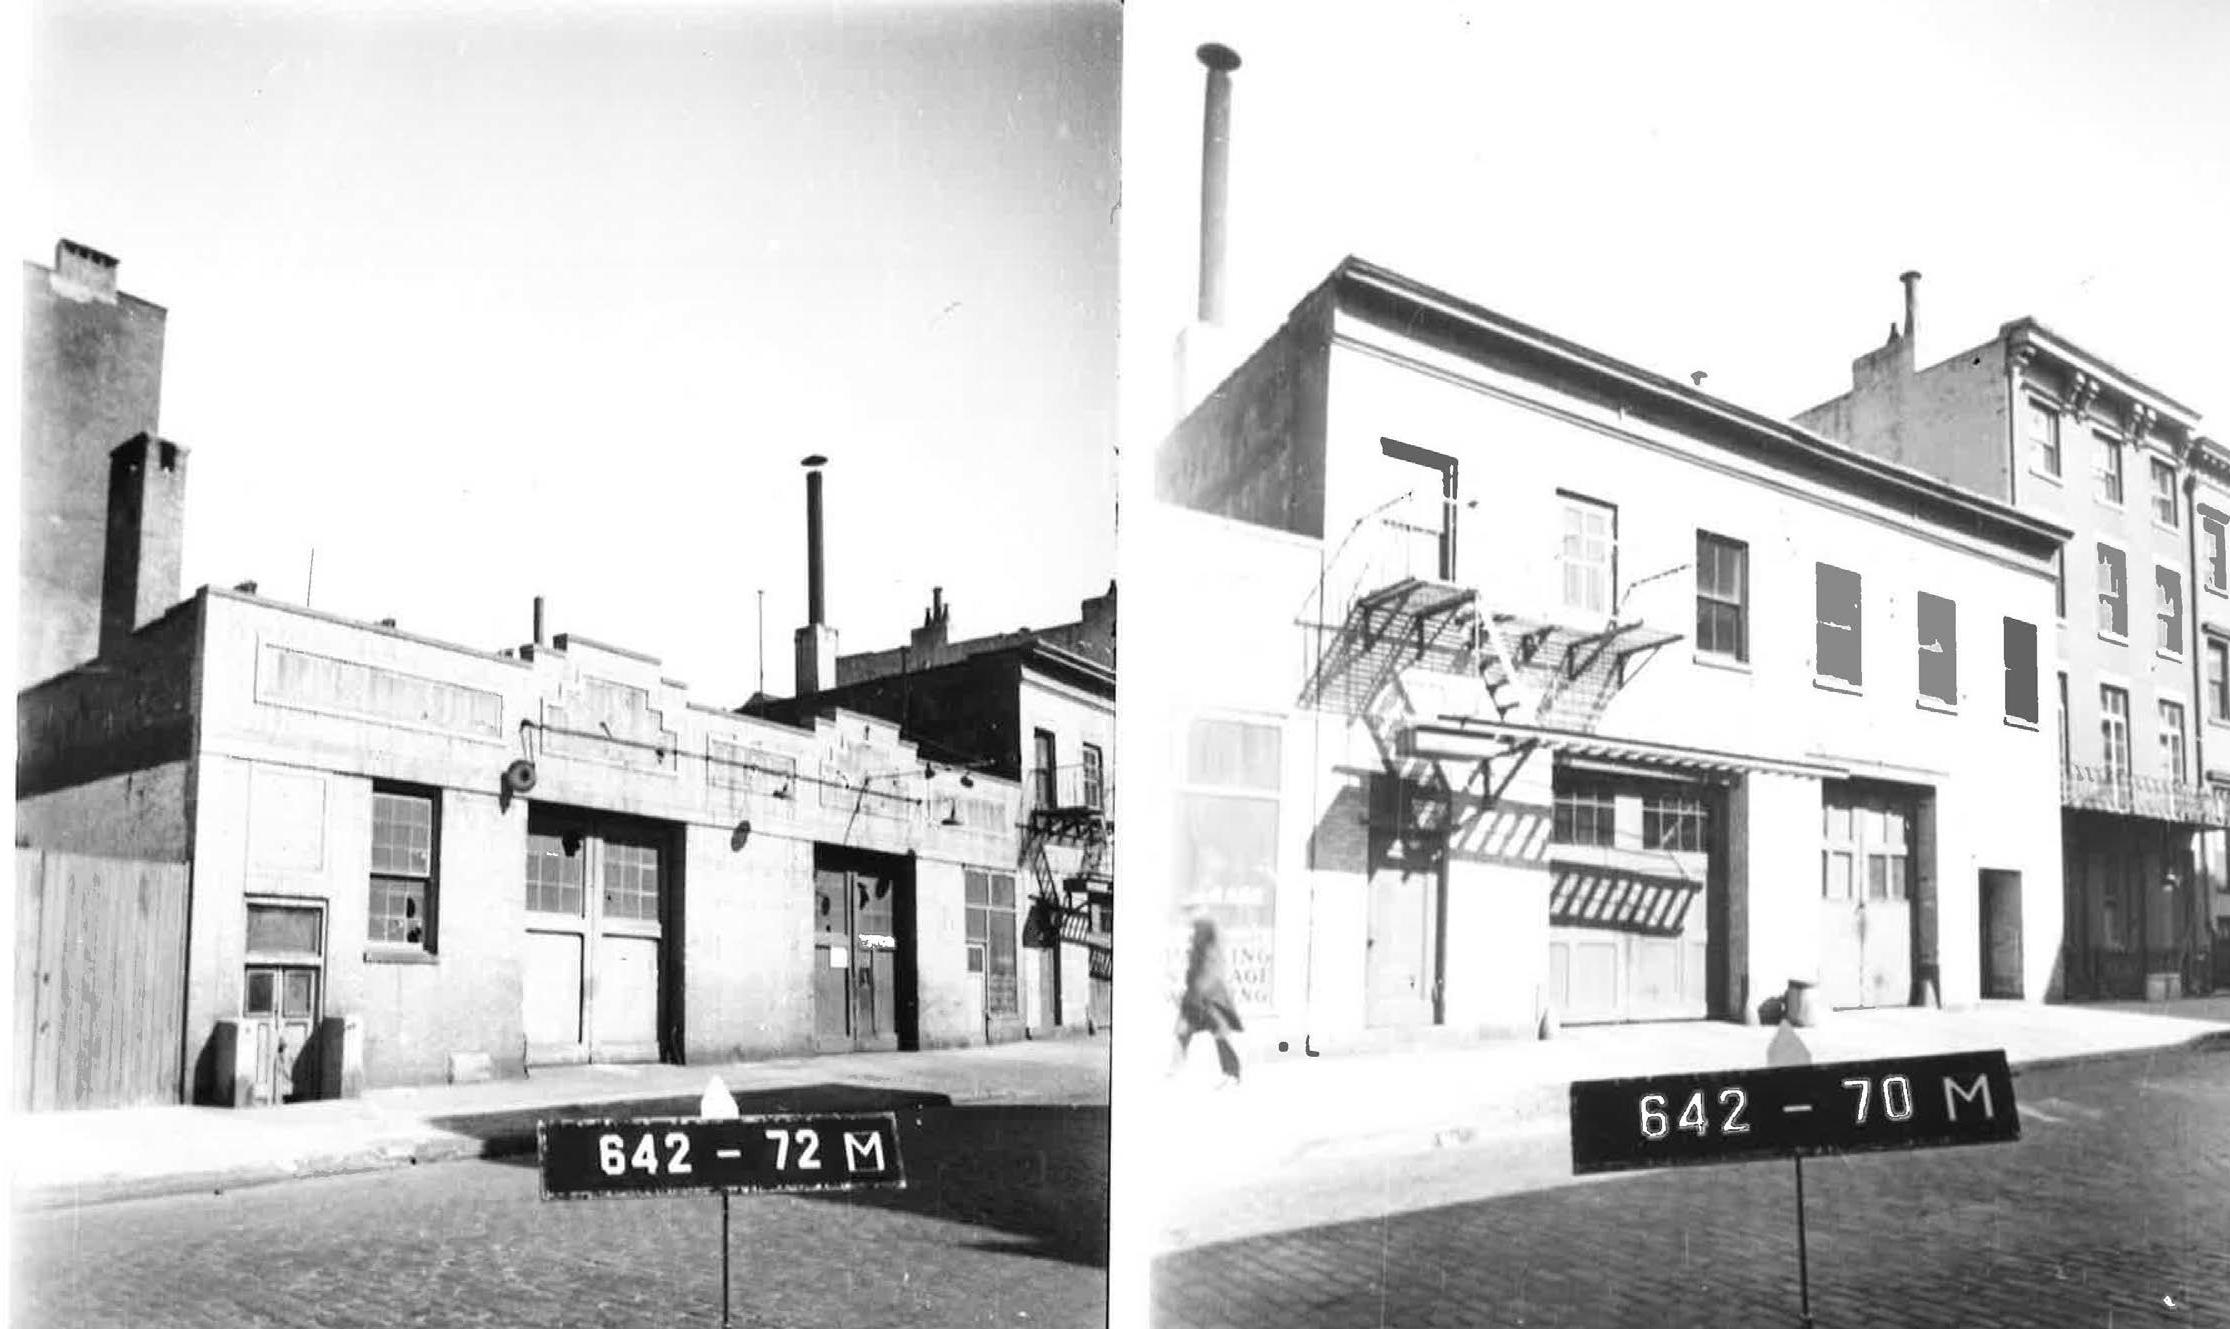 Tax photos of 89 Jane Street and 85 Jane Street